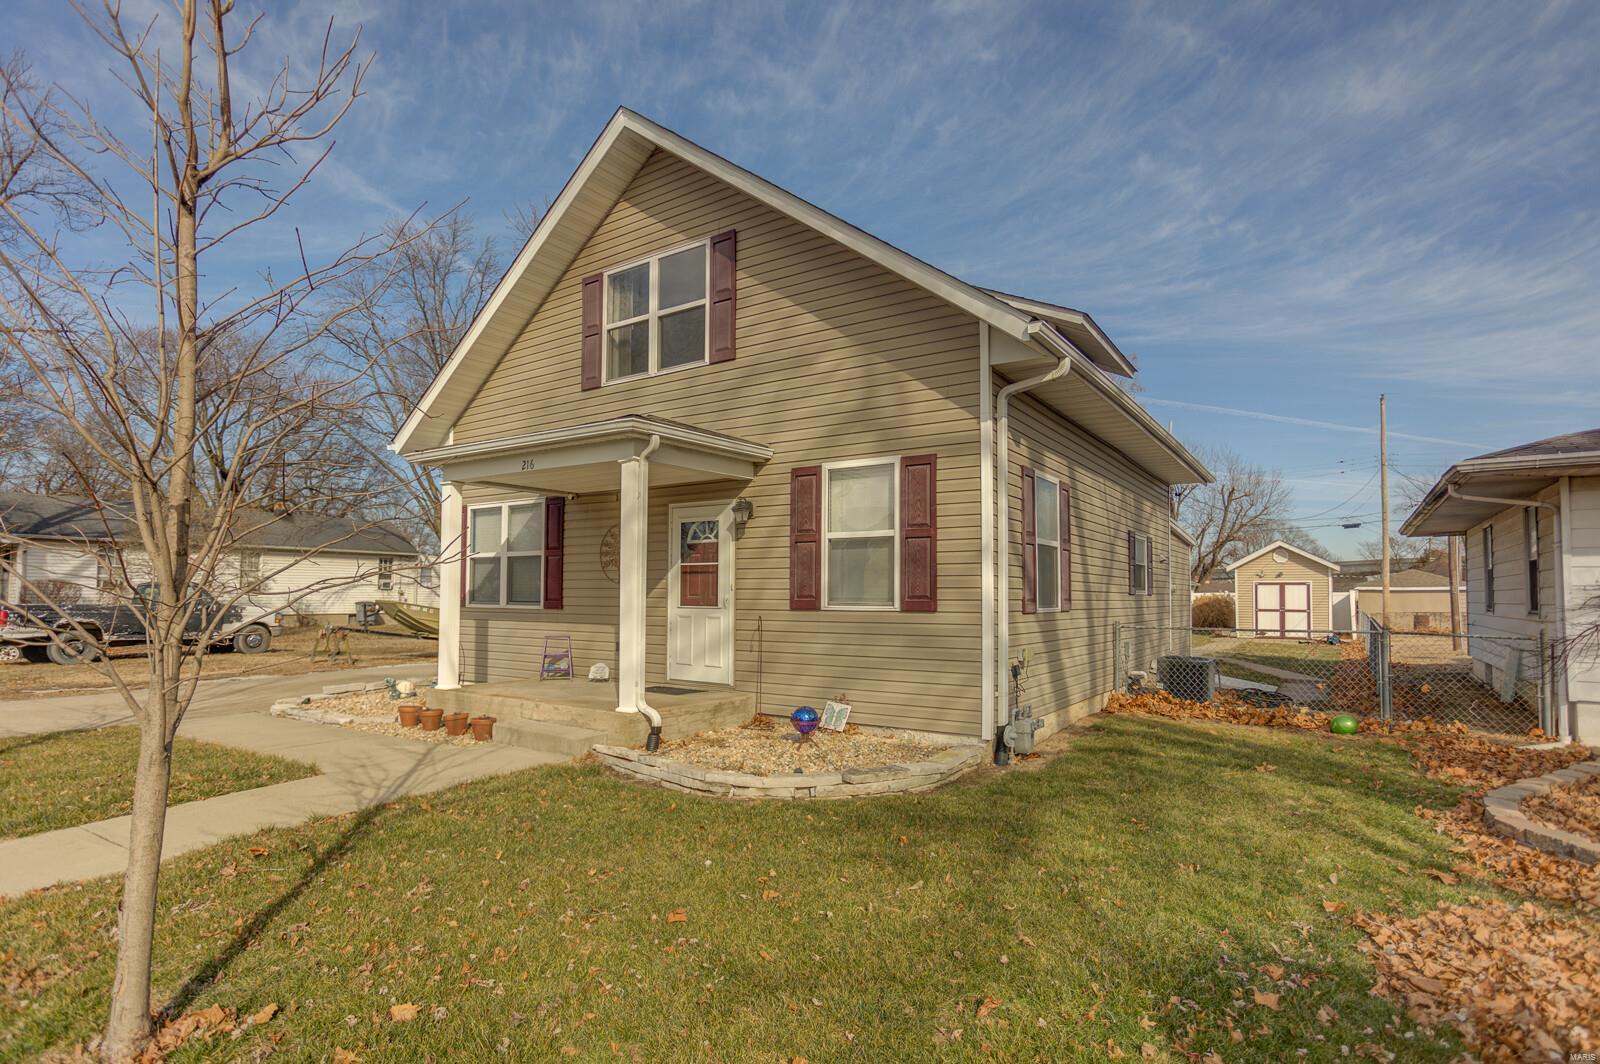 216 Boismenue Avenue Property Photo - East Carondelet, IL real estate listing